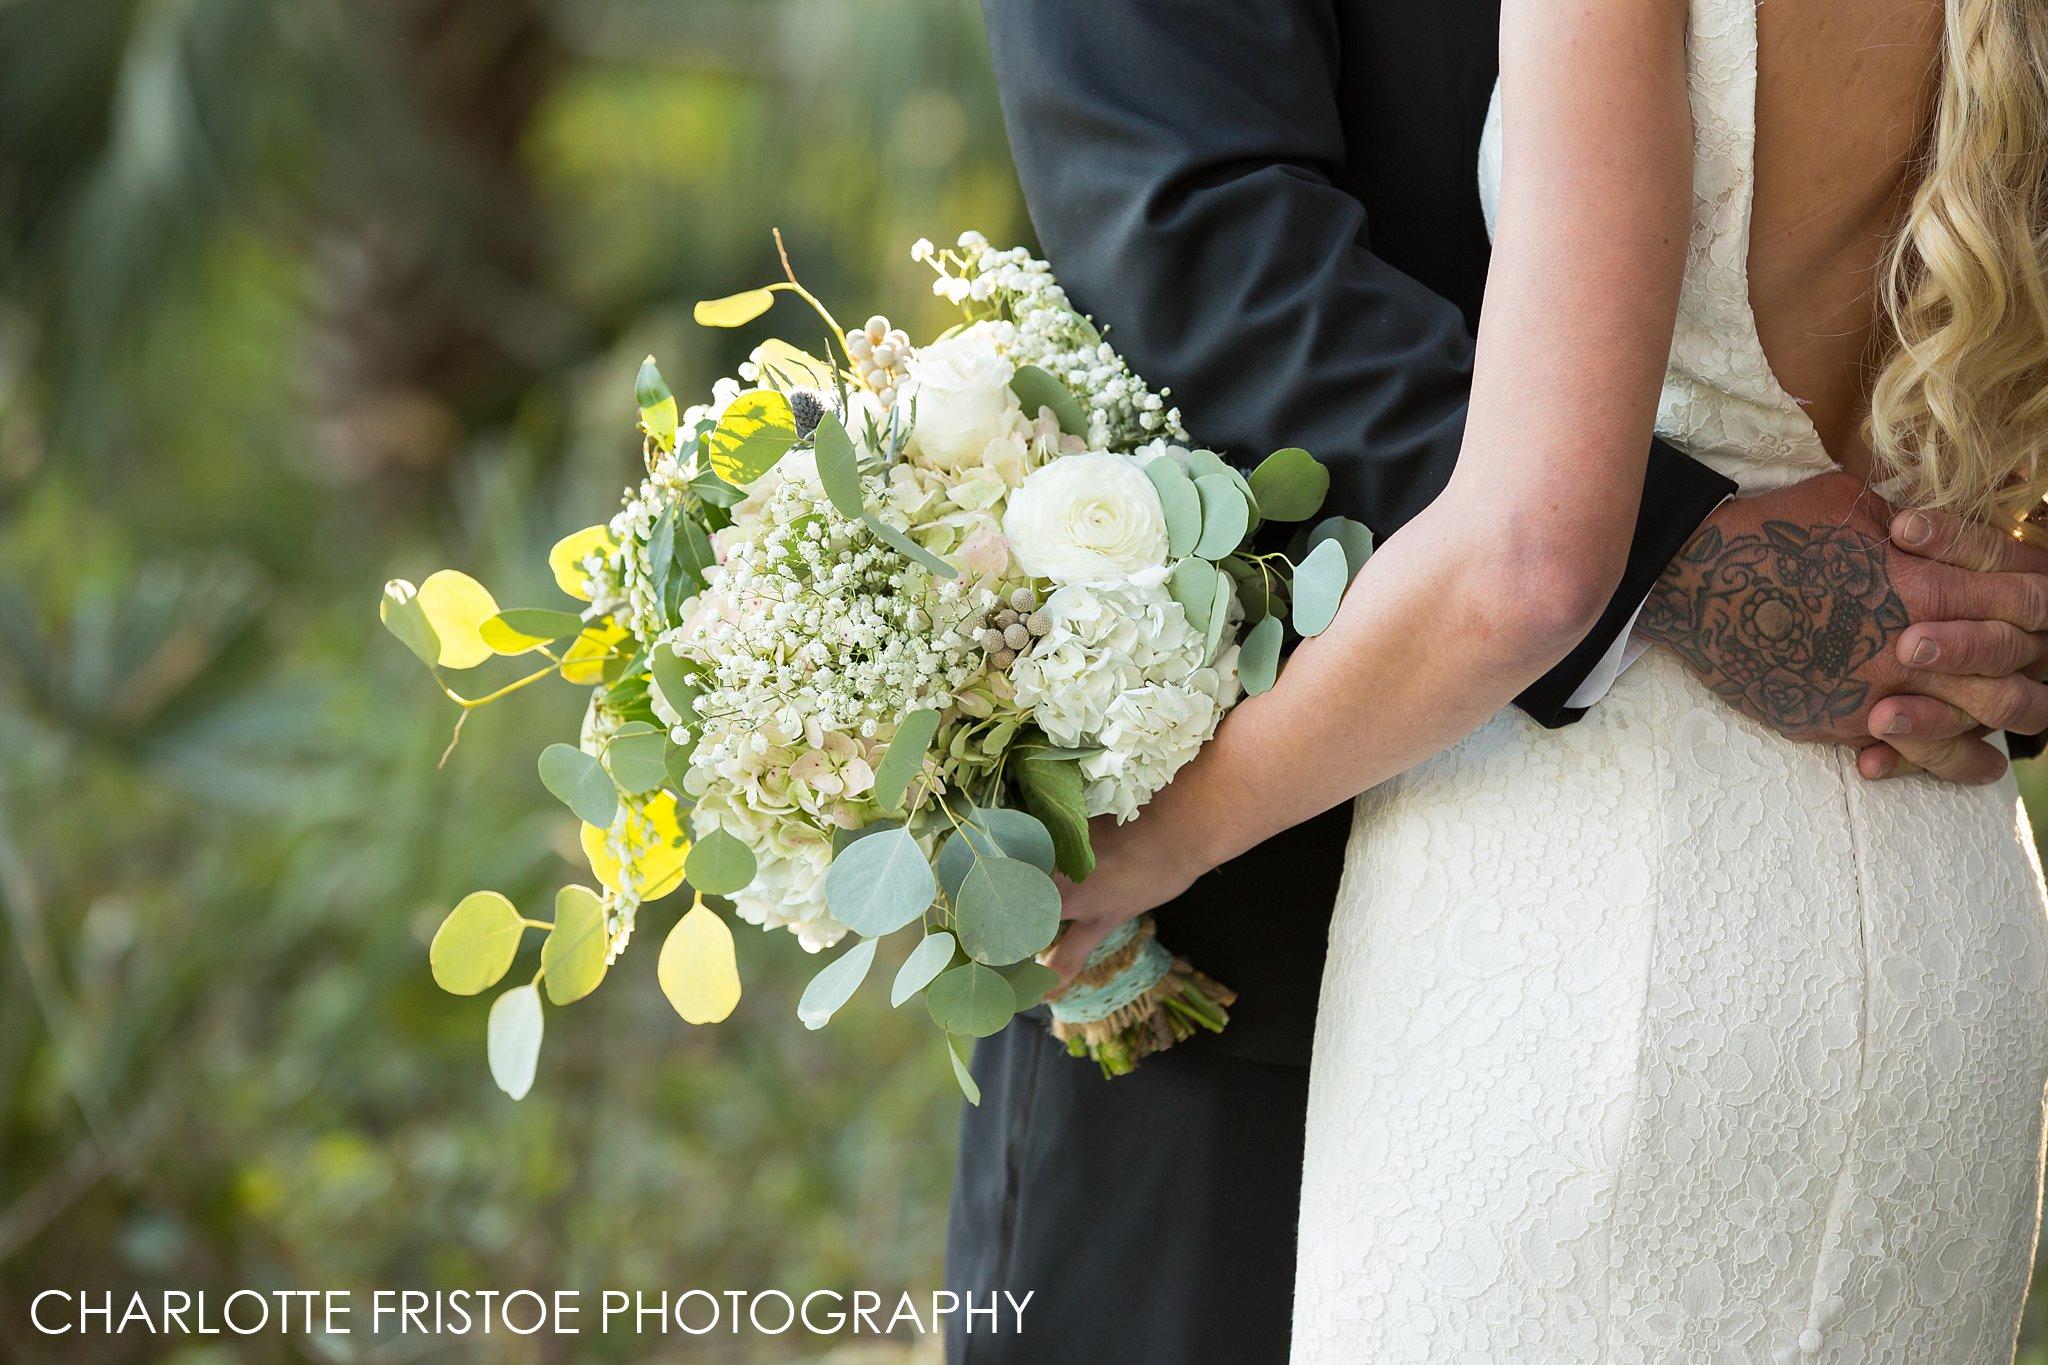 Charlotte Fristoe Photography-25.jpg